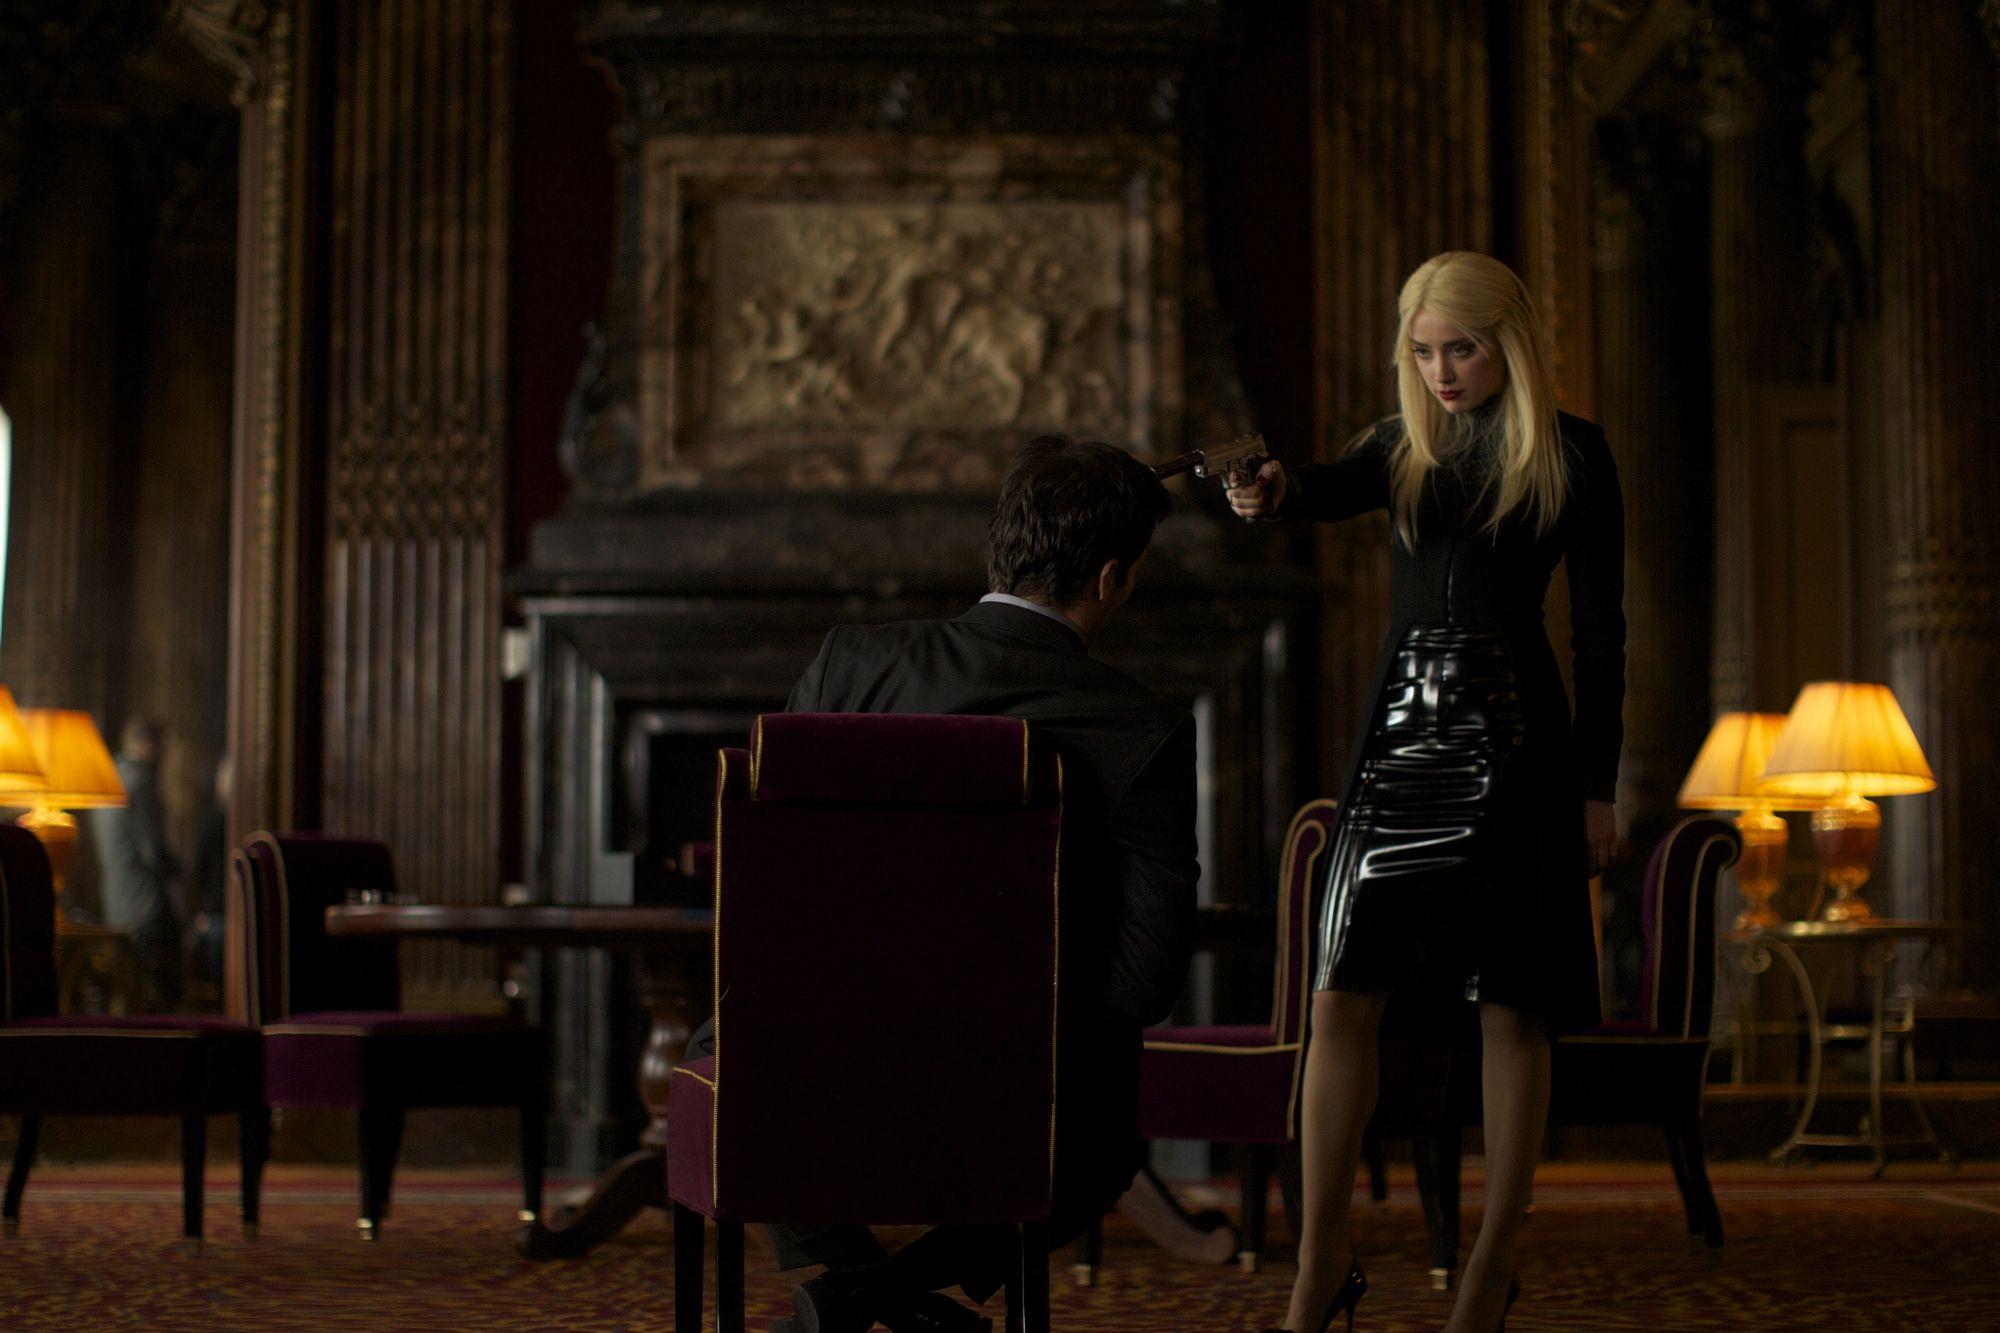 Amber Heard As Vivi Delay In 3 Days To Kill 3 Days To Kill Amber Heard The Stepfather